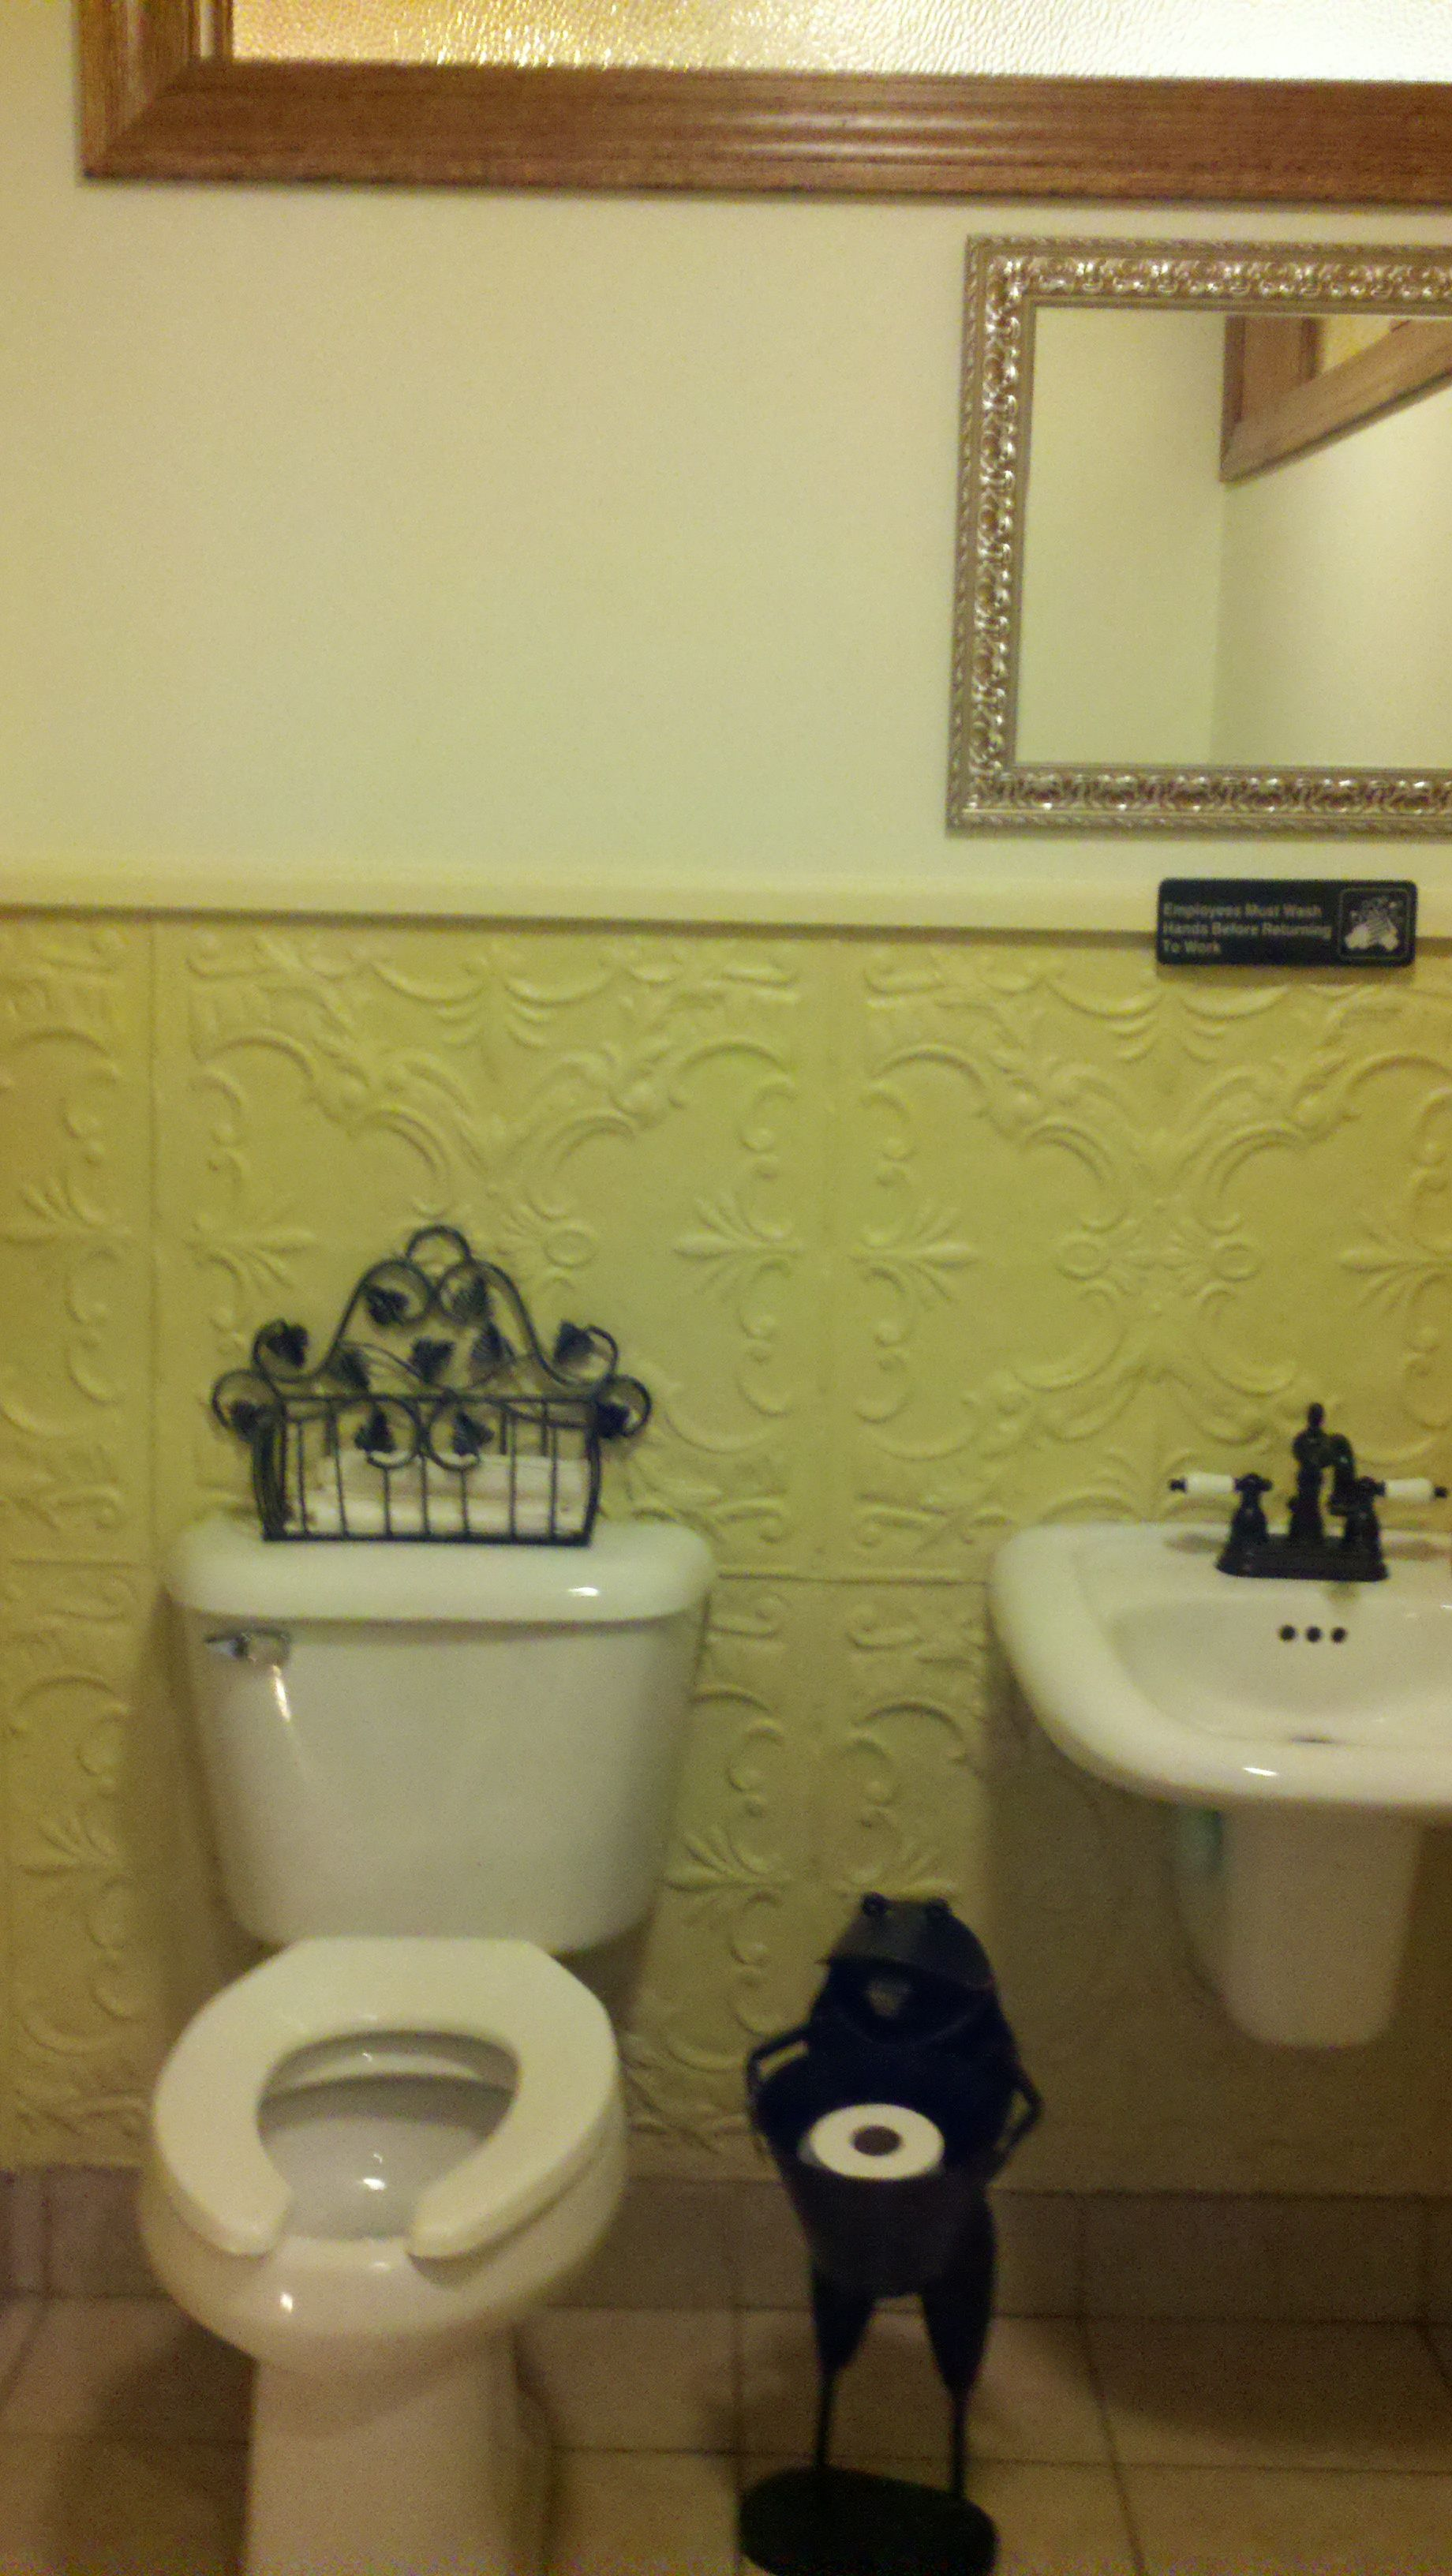 WASCO, Inc. Ceiling Tiles | For the Home | Pinterest | Ceiling tiles ...